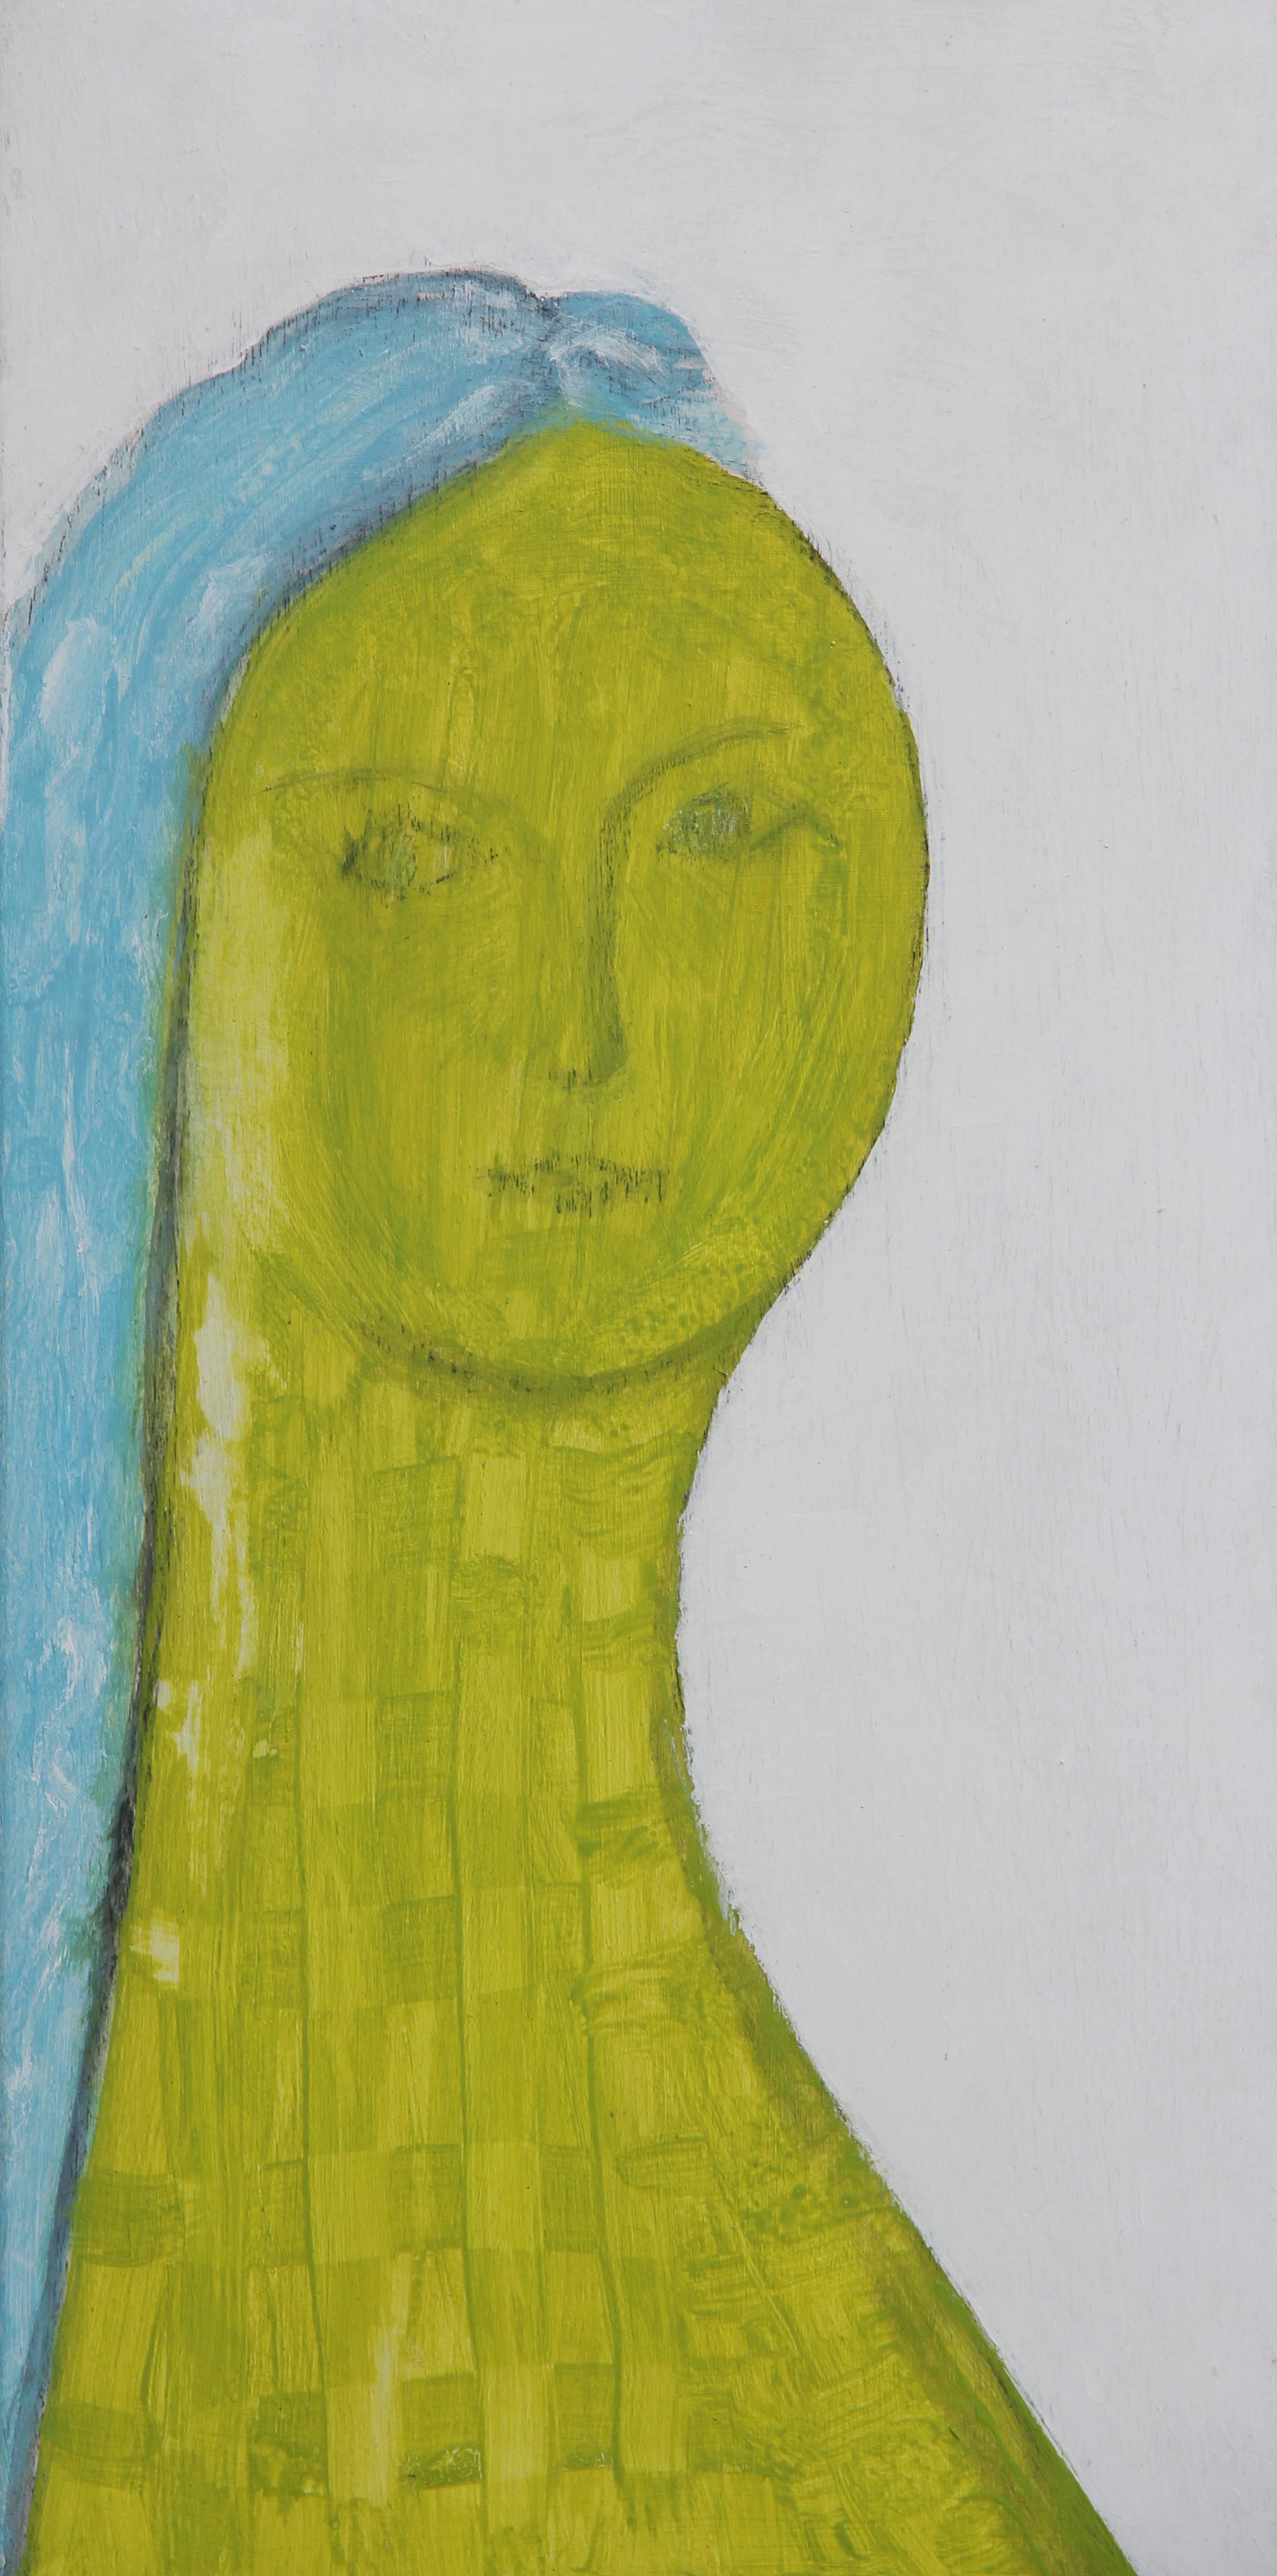 Turchina, 2019 - acrilico su tavola, cm 25x50